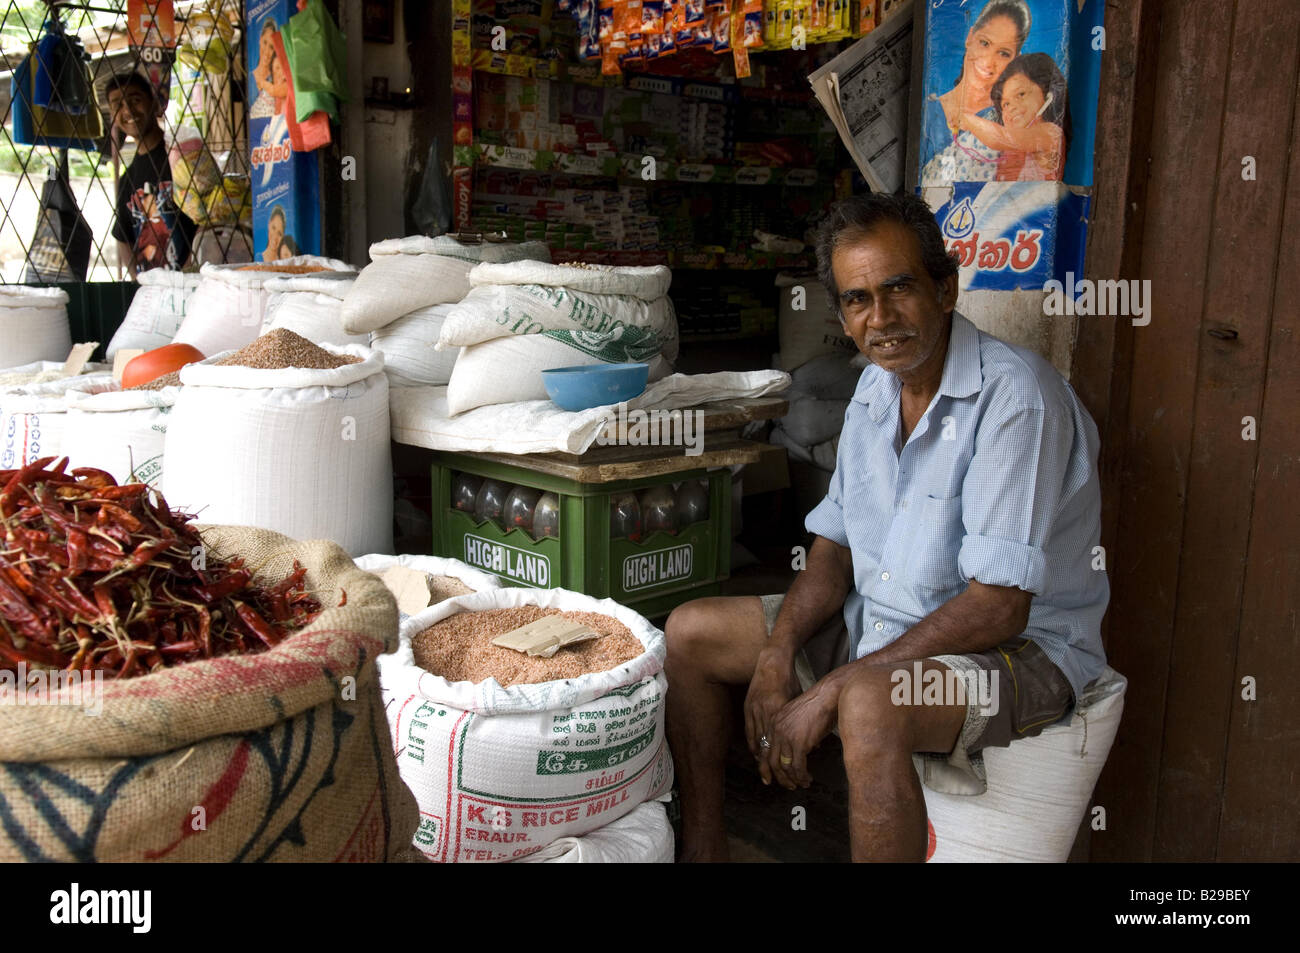 Aluthgama Sri Lanka Date 20 04 2008 Ref ZB648 115261 0009 COMPULSORY CREDIT World Pictures Photoshot - Stock Image